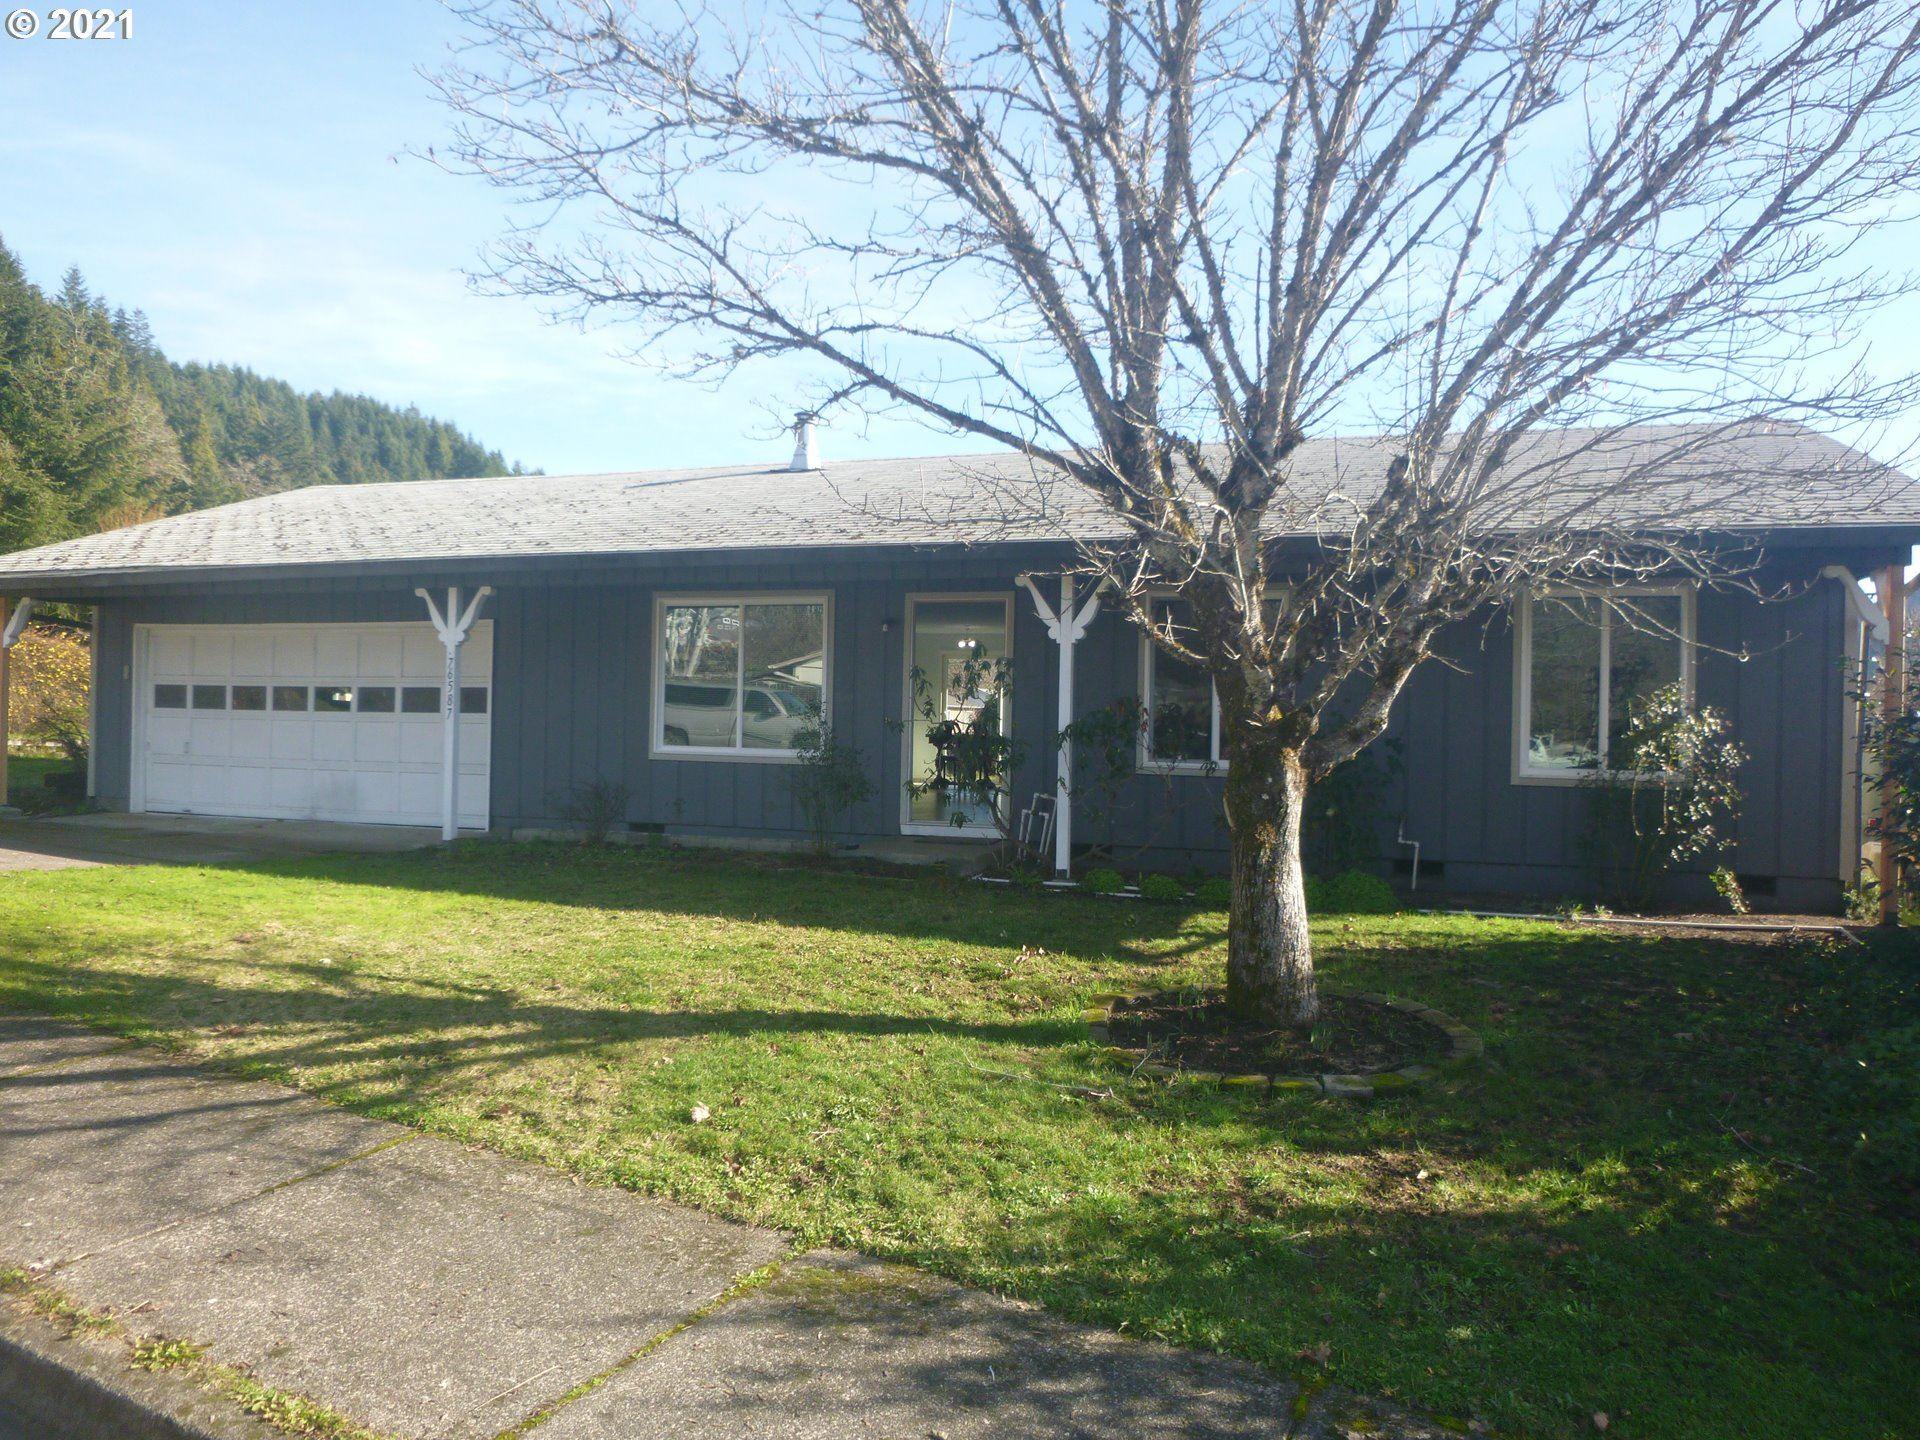 Photo for 76587 GREENRIDGE DR, Oakridge, OR 97463 (MLS # 21278420)